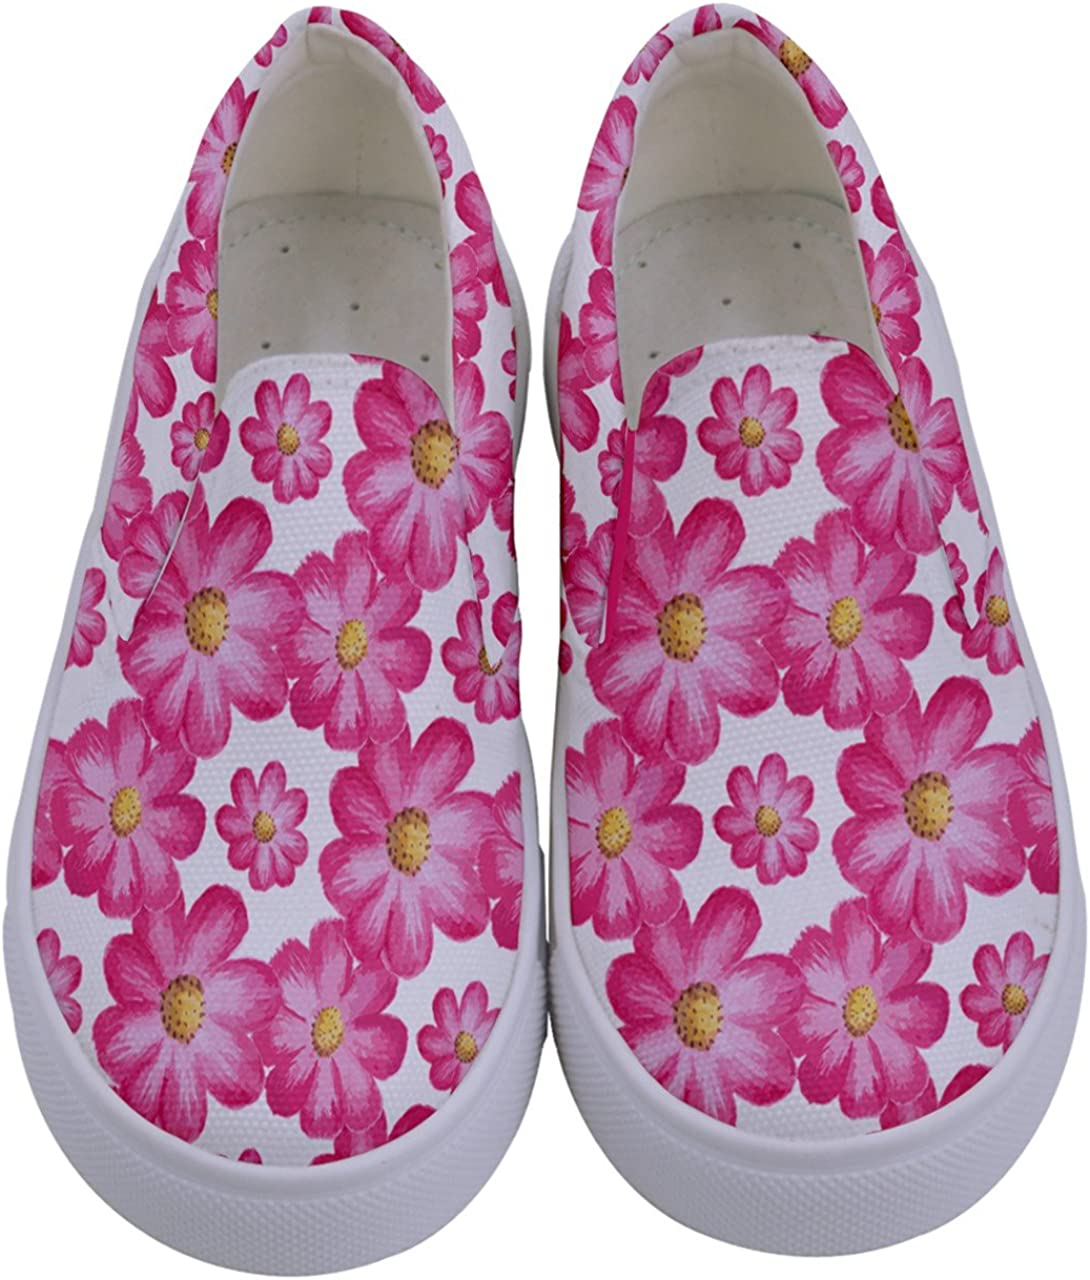 Size:US 8C-7Y PattyCandy Girls Animals /& Nature Kids Canvas Slip-On Shoes